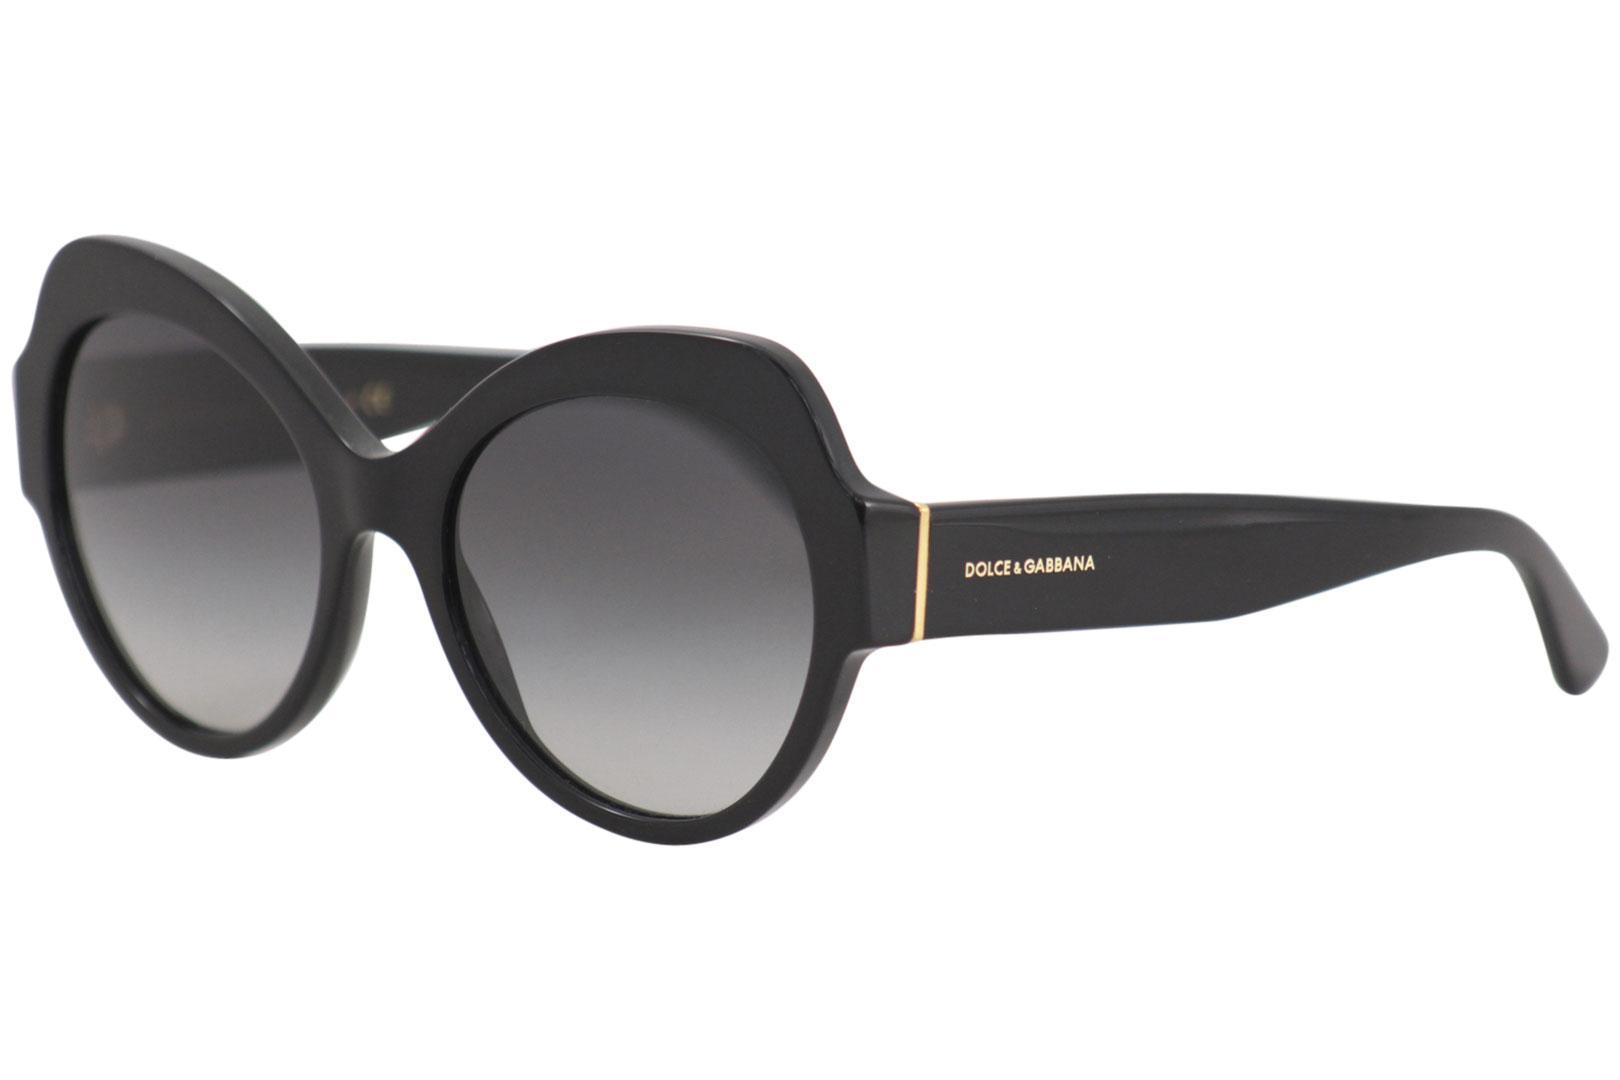 2f975135c8dc Dolce   Gabbana Women s D G DG4320 DG 4320 Fashion Cat Eye ...